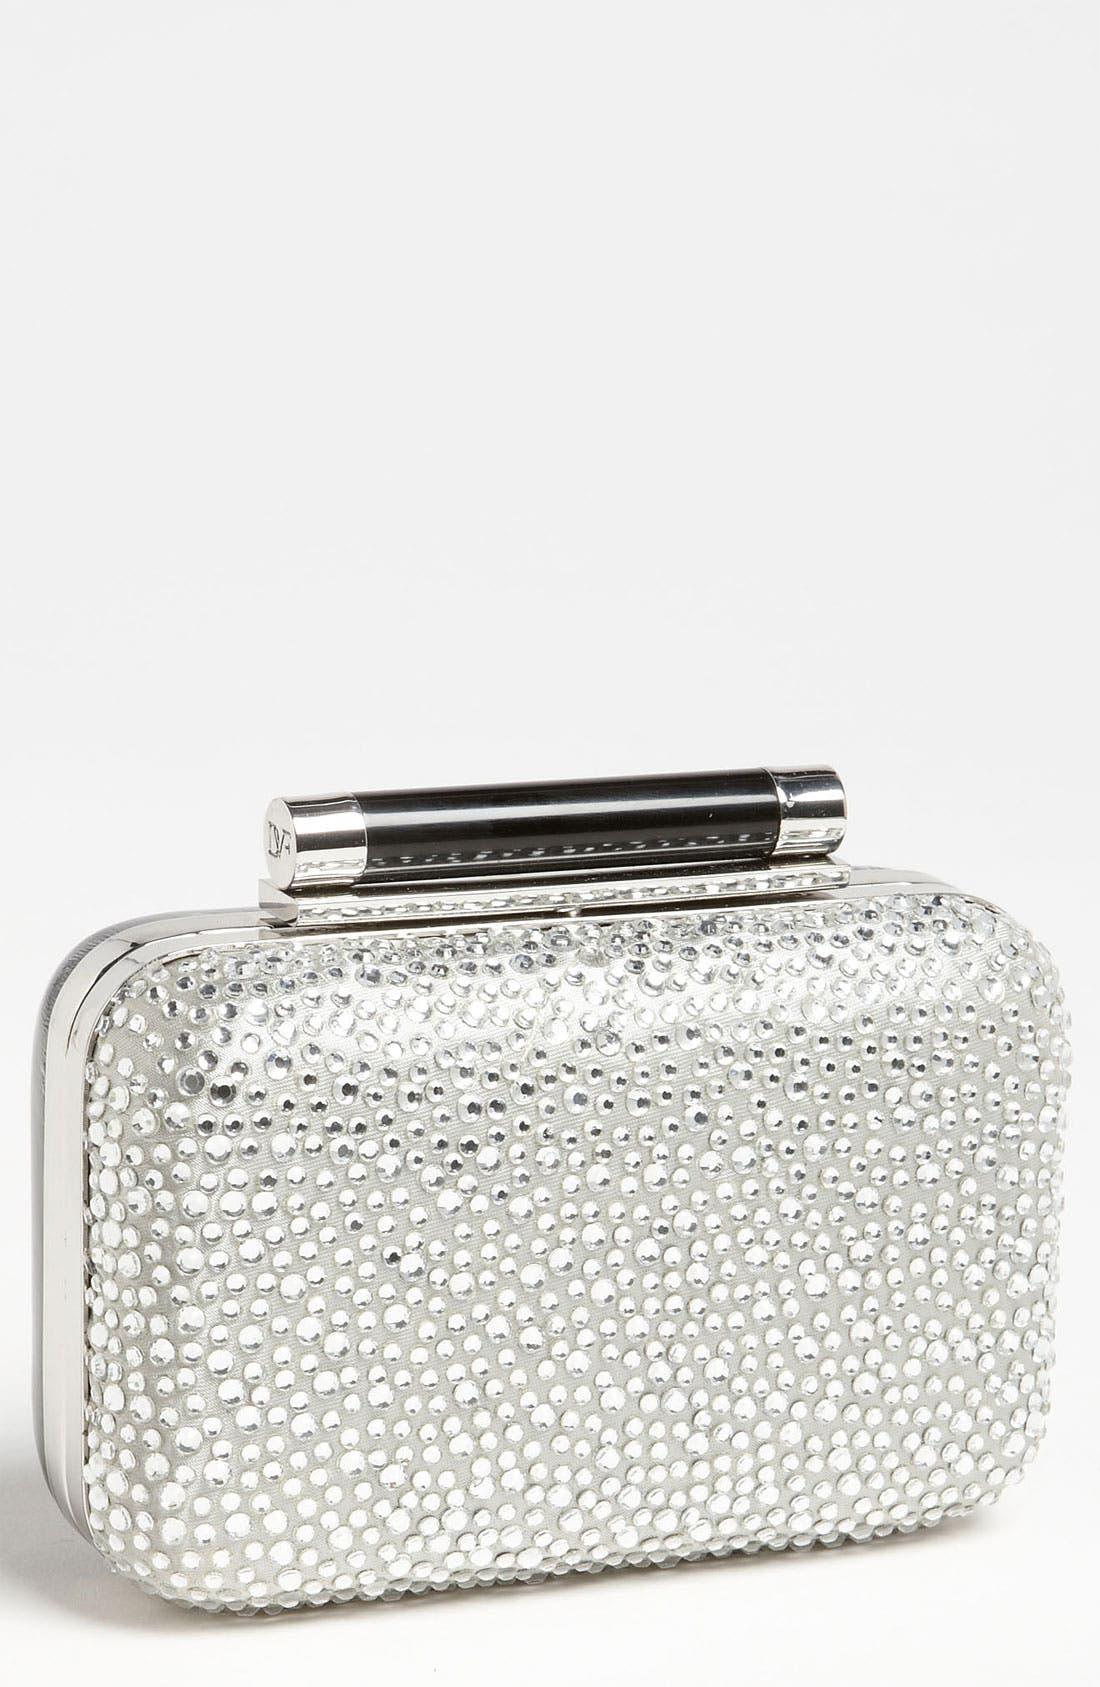 Alternate Image 1 Selected - Diane von Furstenberg 'Tonda - Small' Pavé Crystal & Patent Leather Clutch